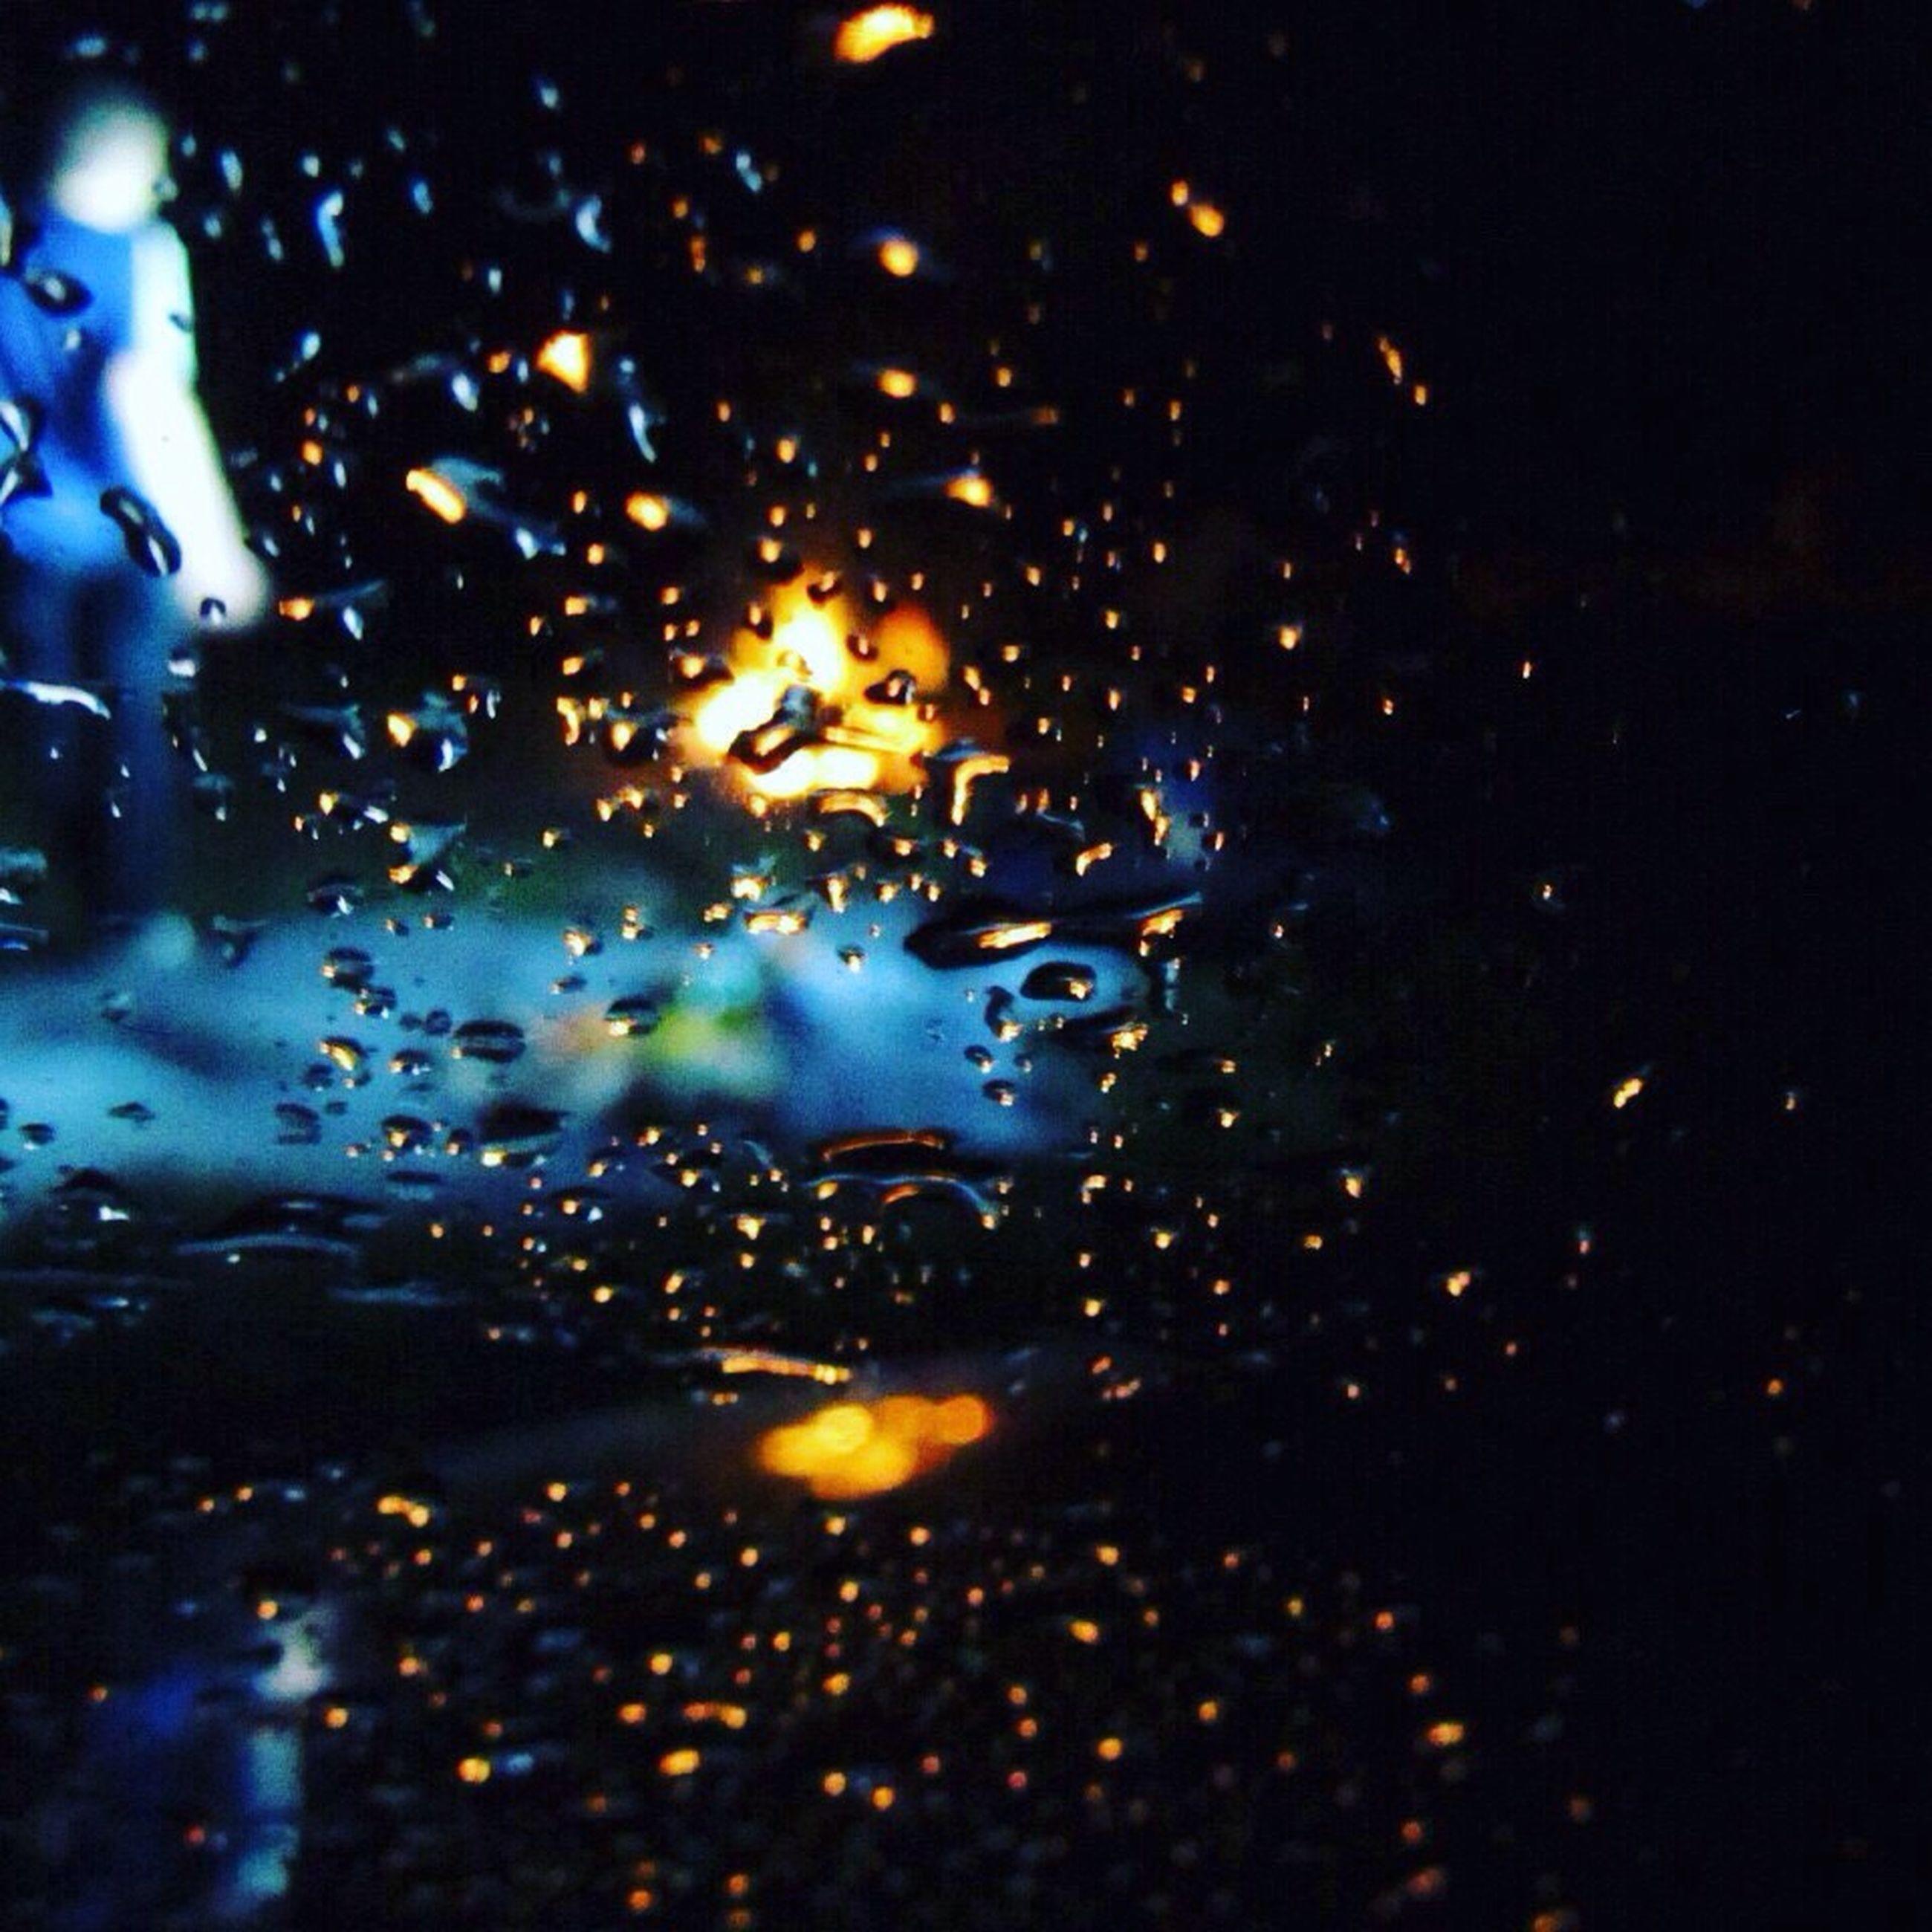 wet, drop, rain, water, window, transparent, raindrop, glass - material, full frame, weather, backgrounds, indoors, season, night, sky, illuminated, glass, car, monsoon, no people